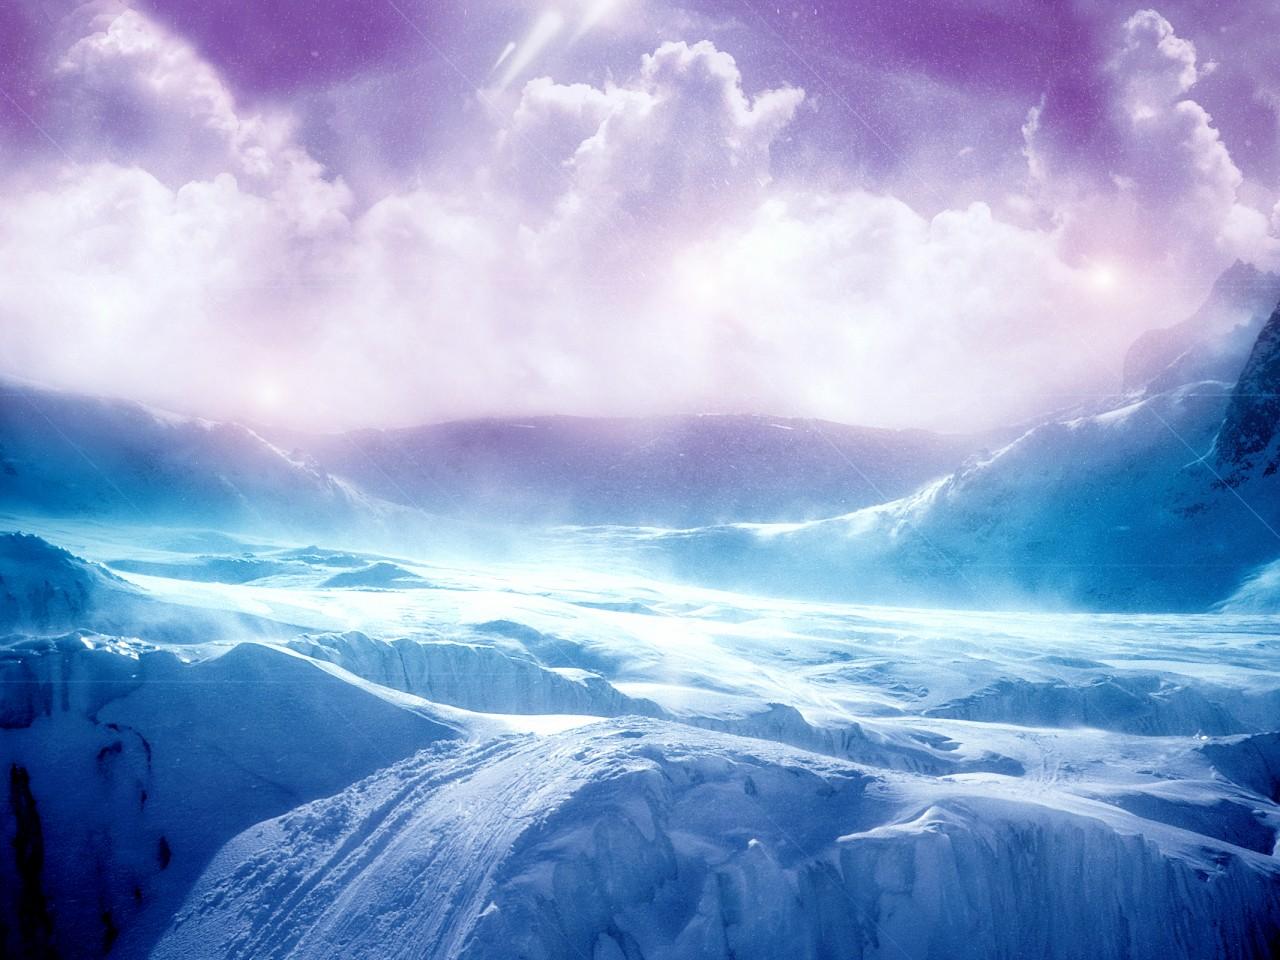 Naruto Iphone 7 Wallpaper High Resolution Ice Terrain Wallpaper Hd Wallpapers